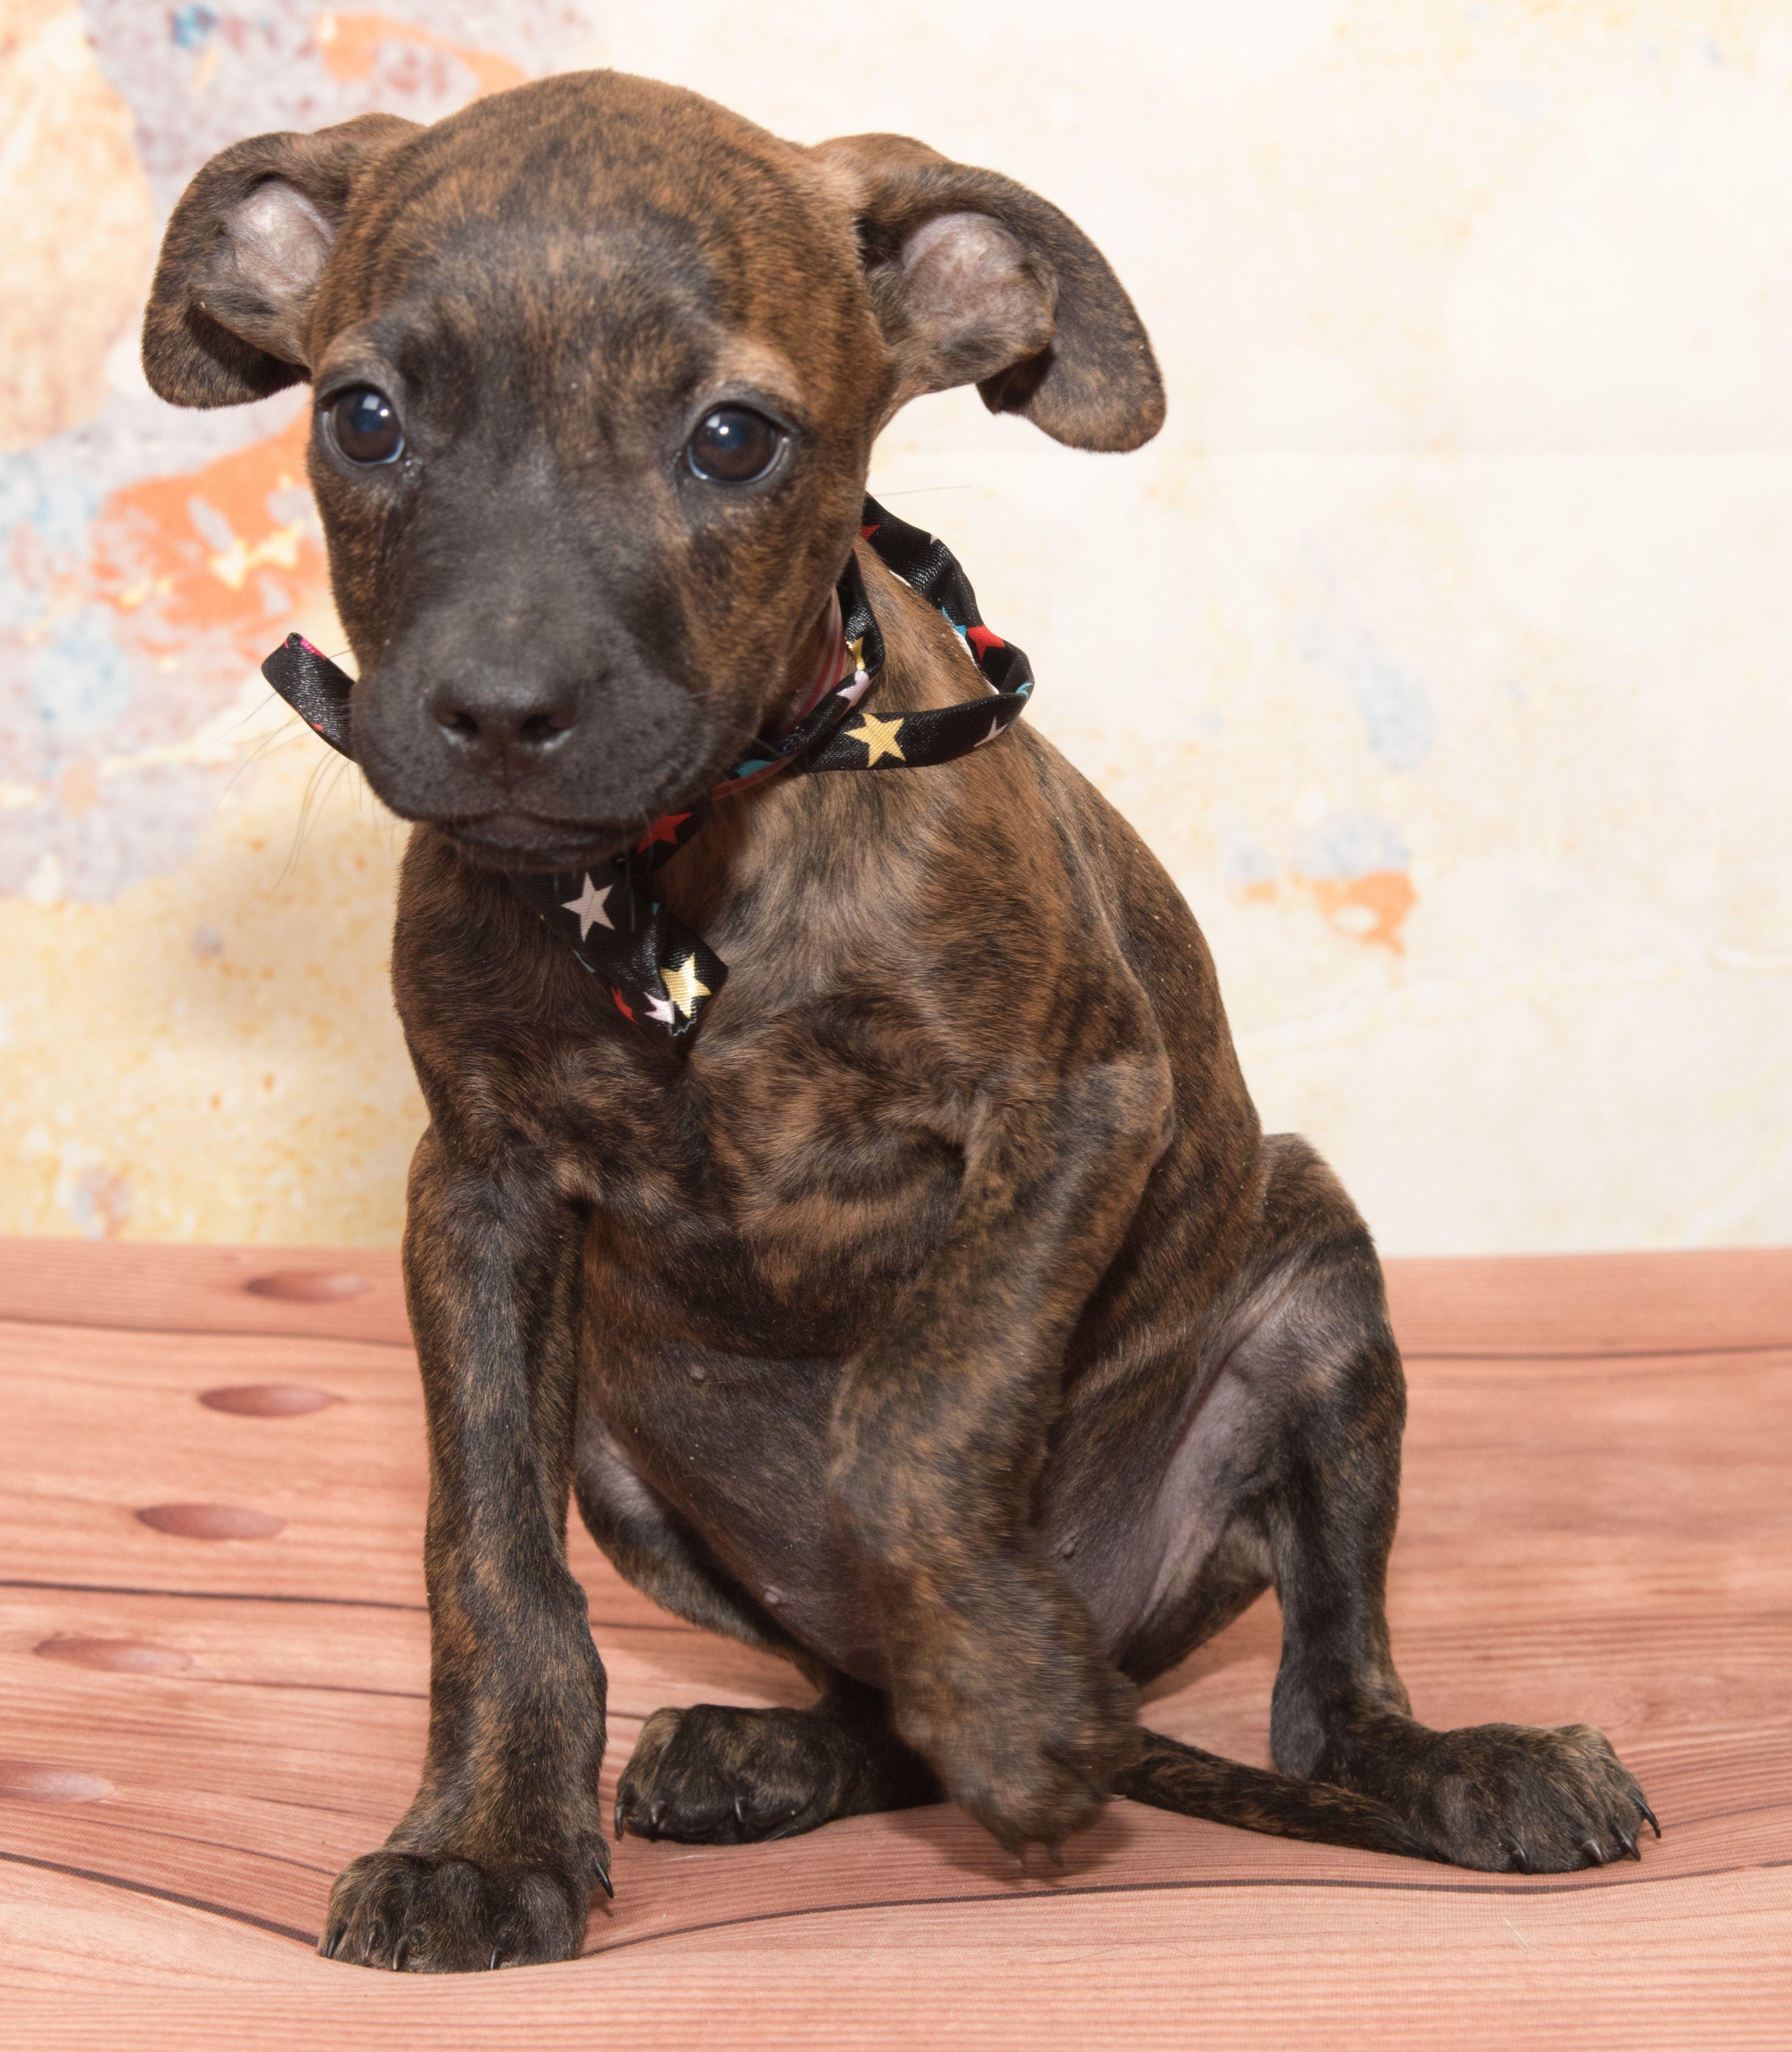 Boxador dog for Adoption in Denver, CO. ADN659785 on